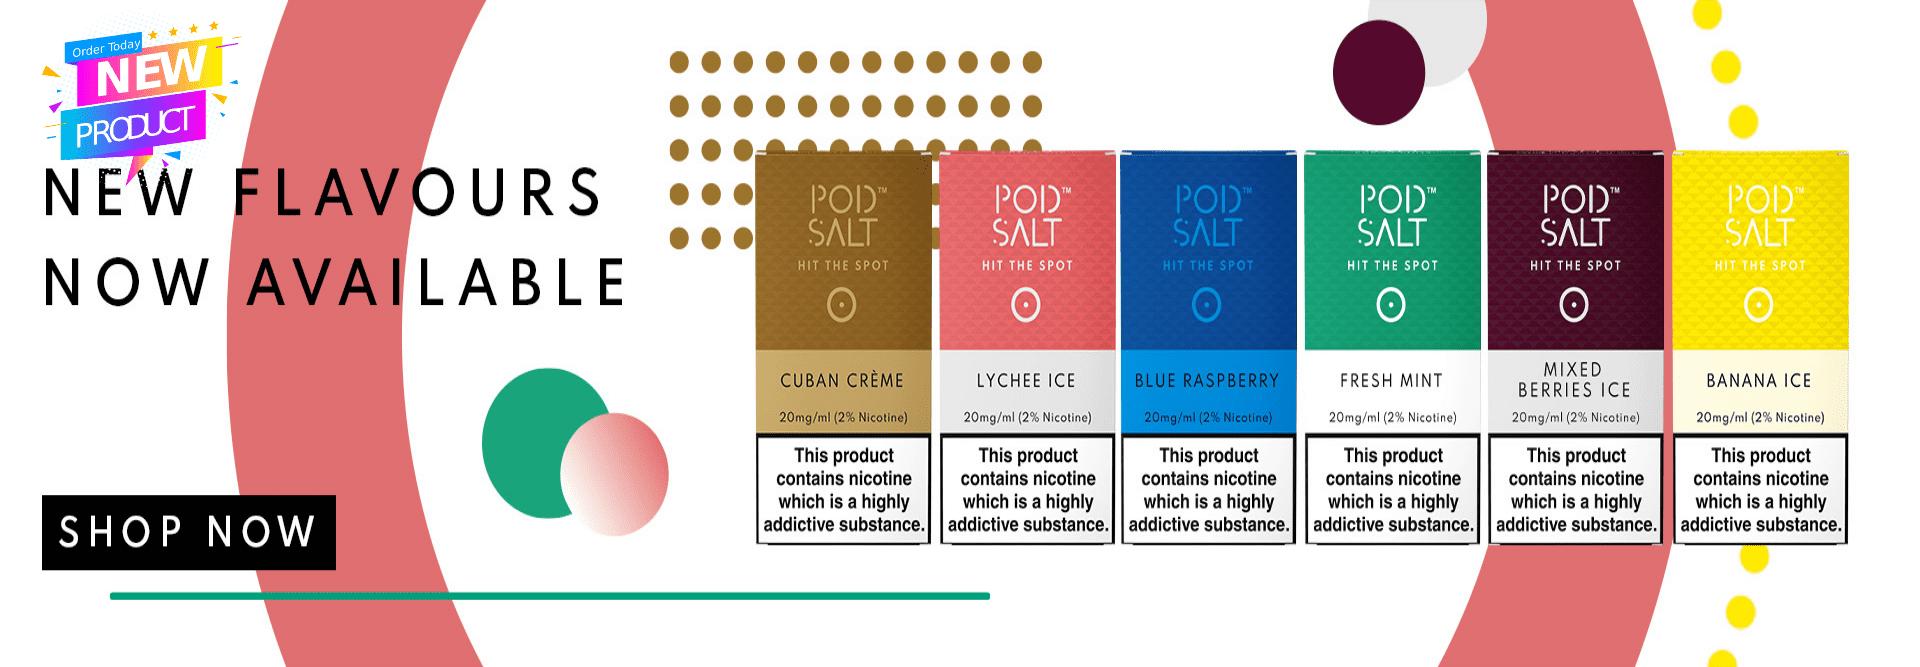 Pod Salt New Flavours